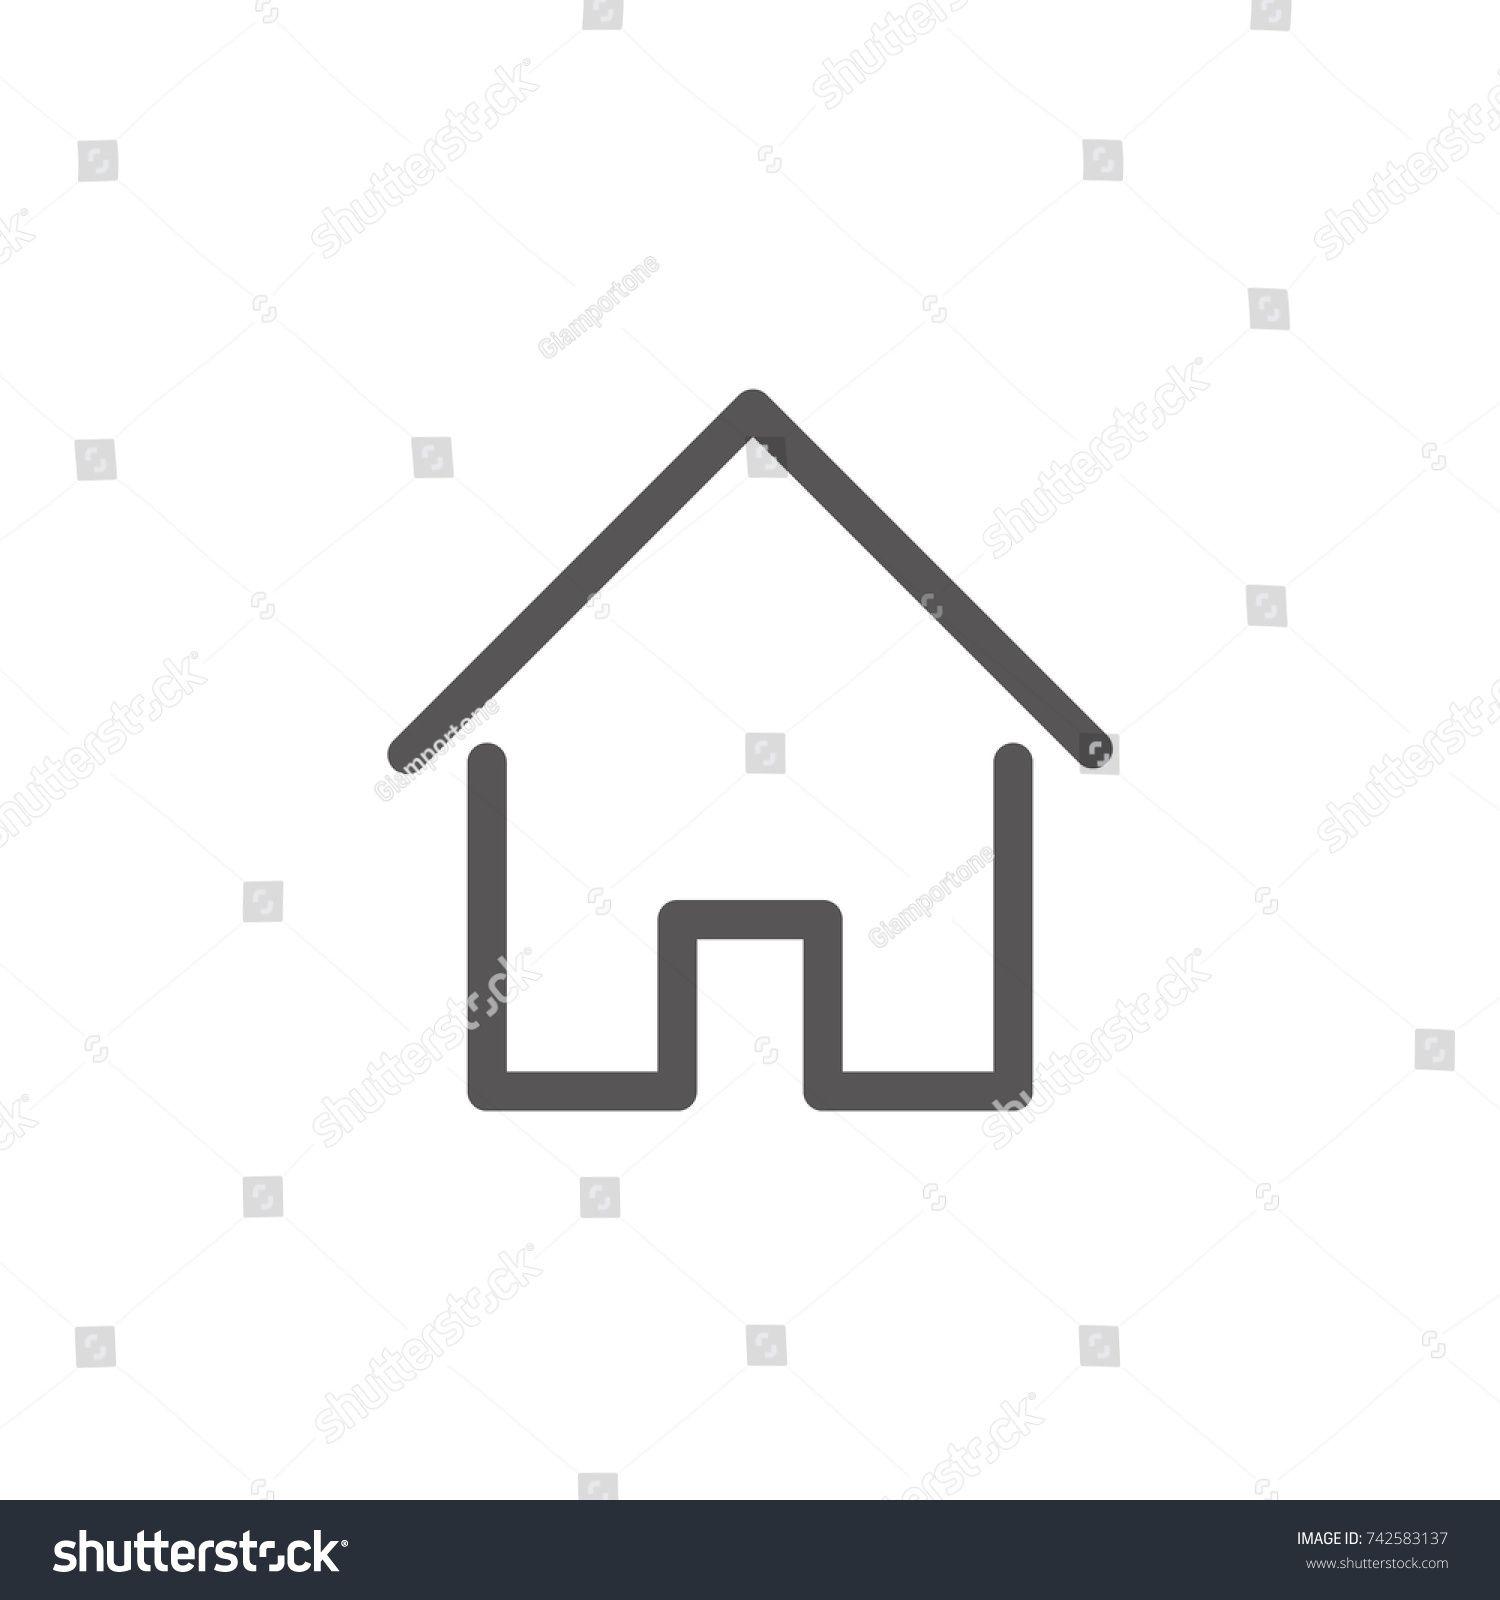 House Icon With Door Outline Design Vector Ad Paid Door Icon House Vector In 2020 Outline Designs Home Icon Vintage Logo Design